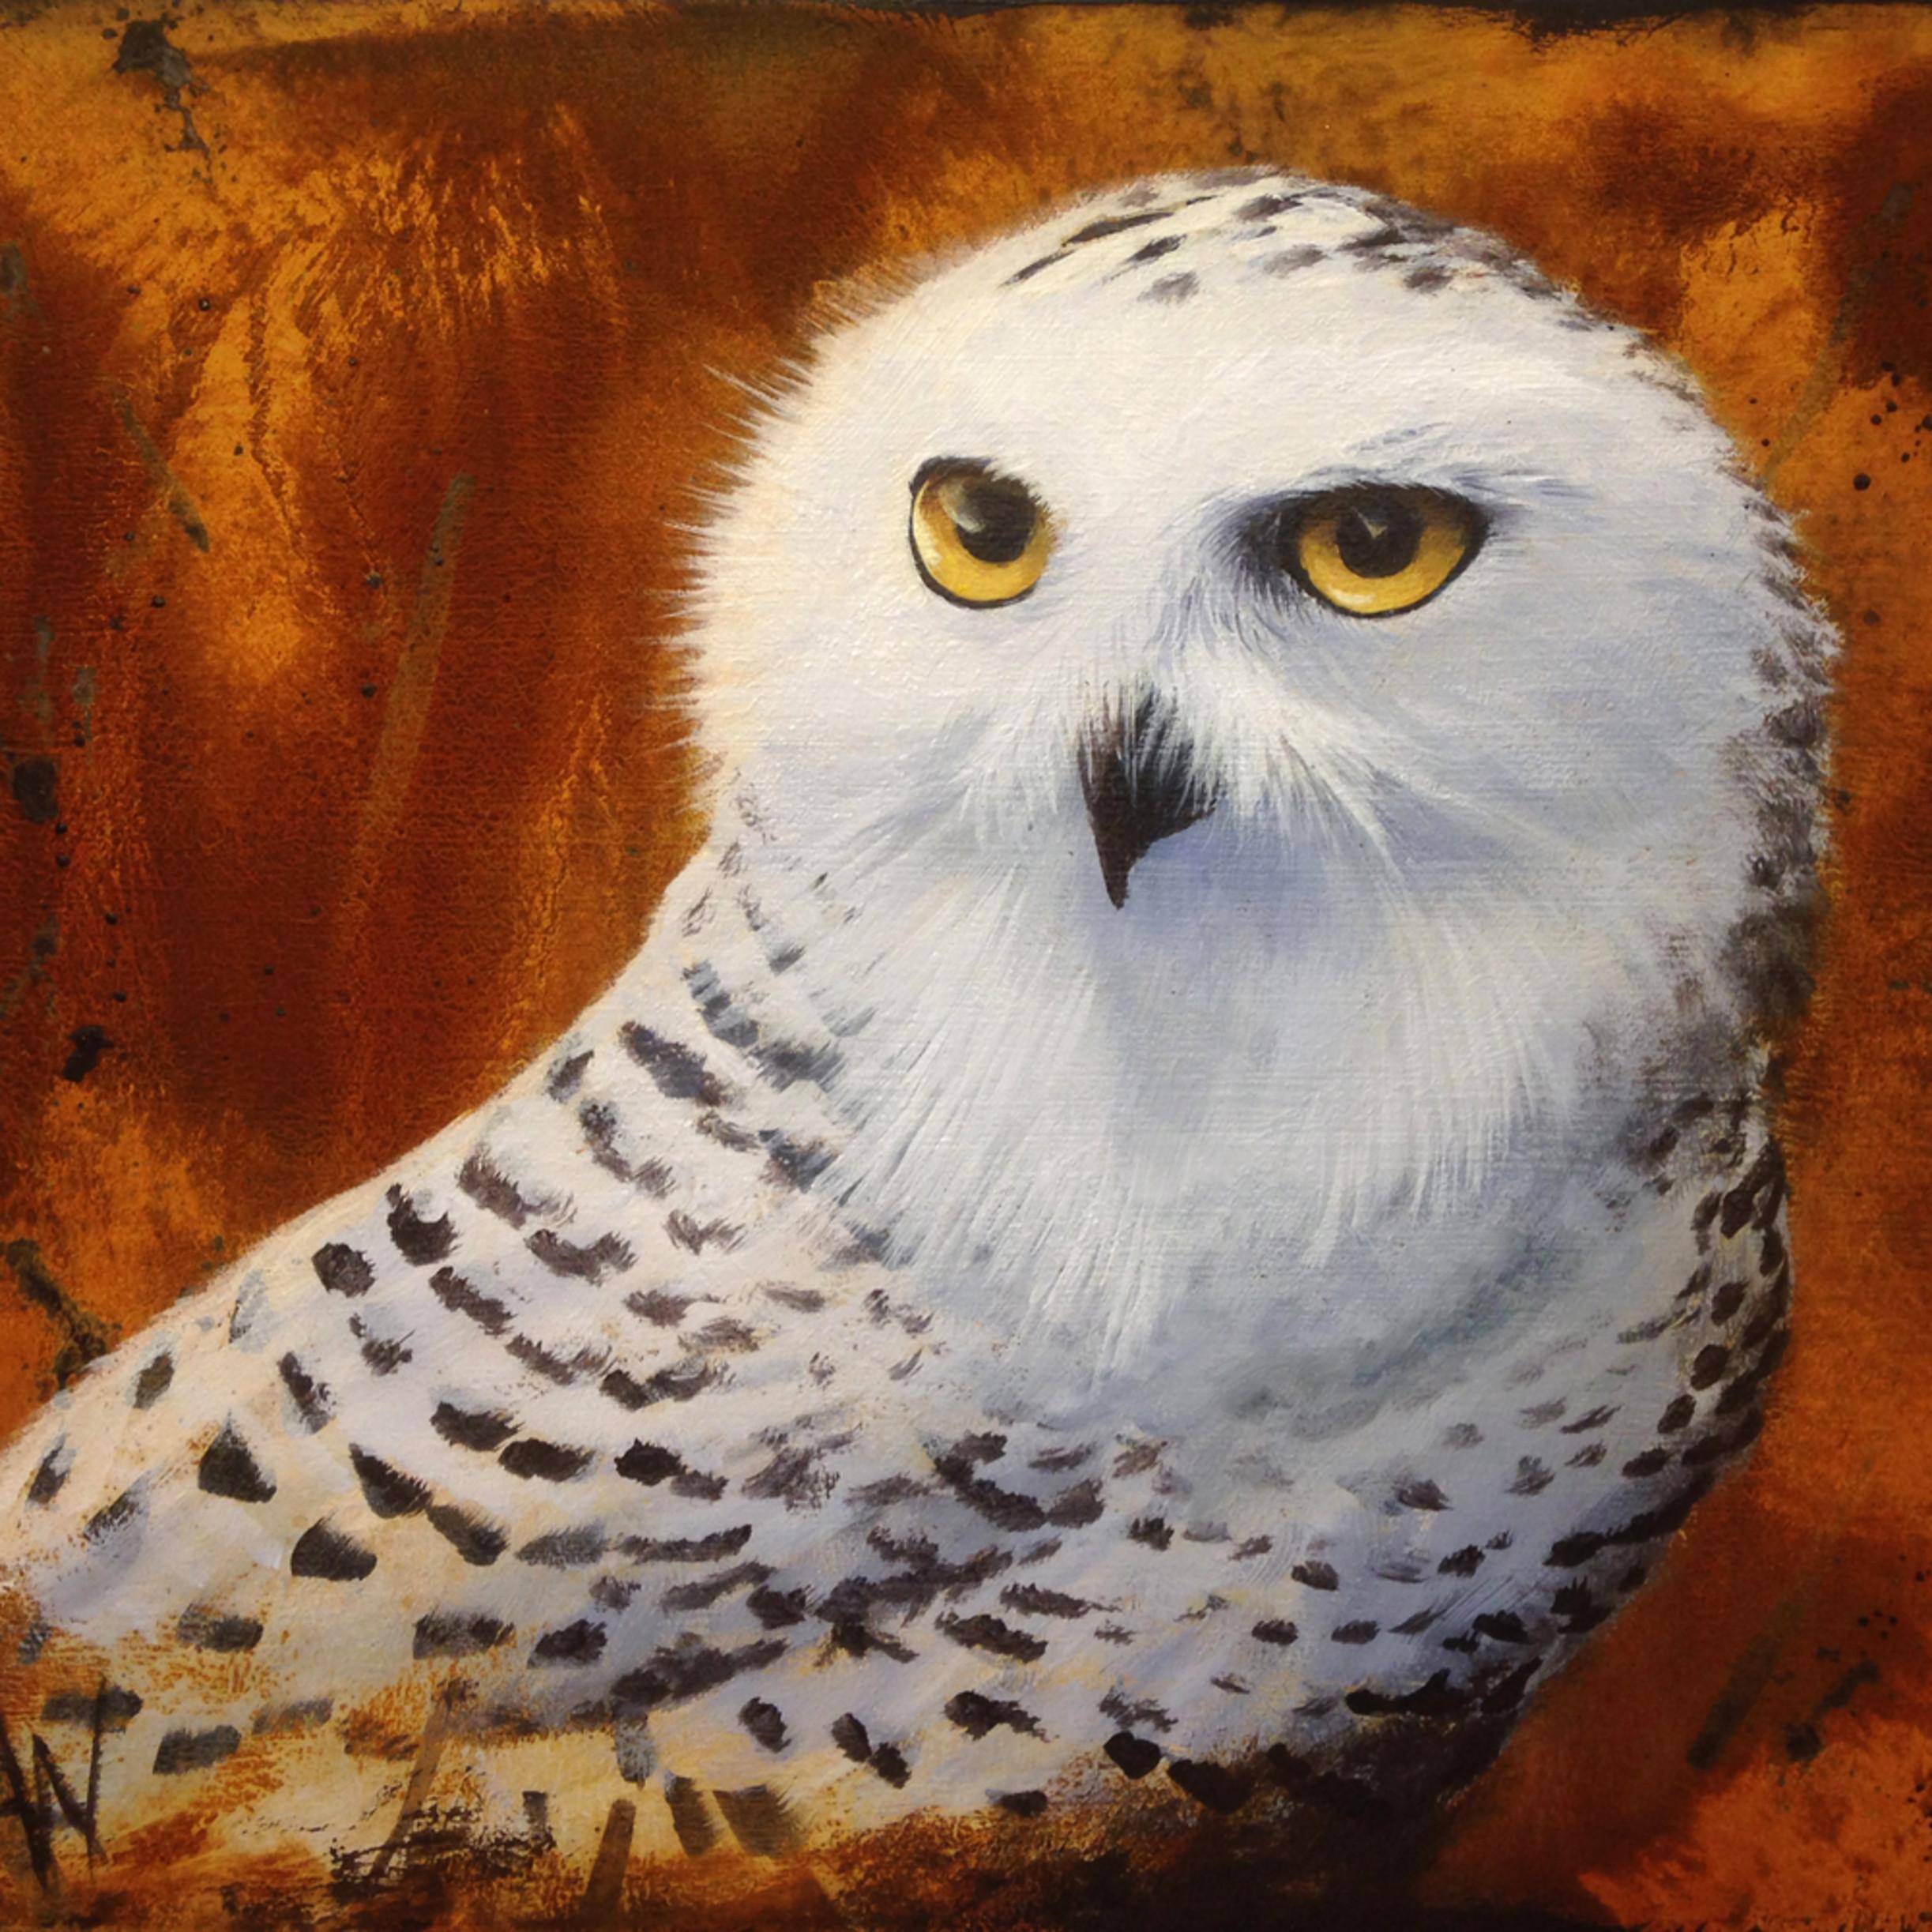 Snowy owl lkby4d